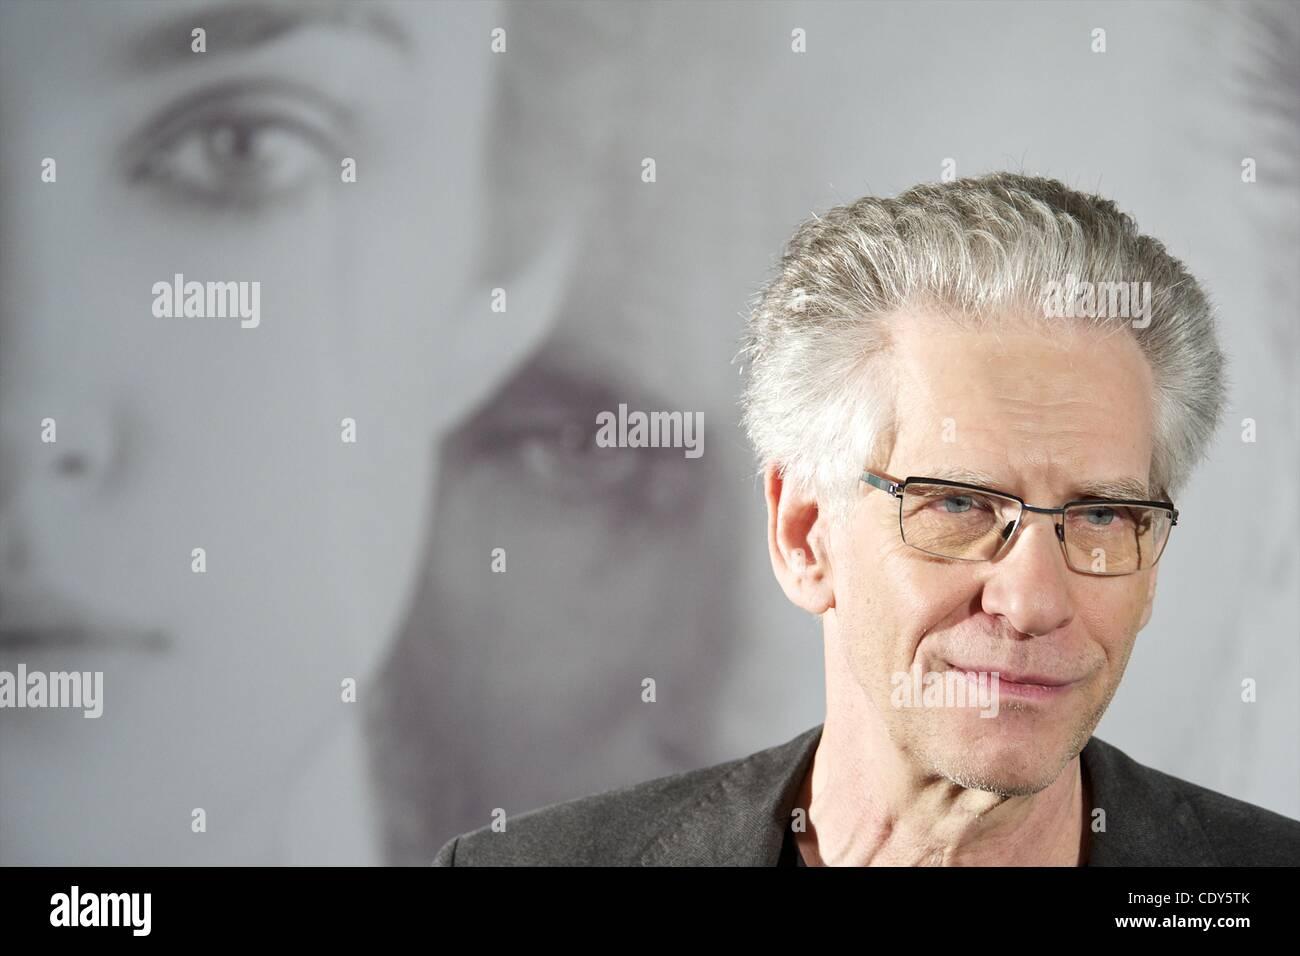 Nov. 2, 2011 - Madrid, Spain - Director David Cronenberg attends 'A Dangerous Method' photocall at Santo Mauro Hotel. Stock Photo